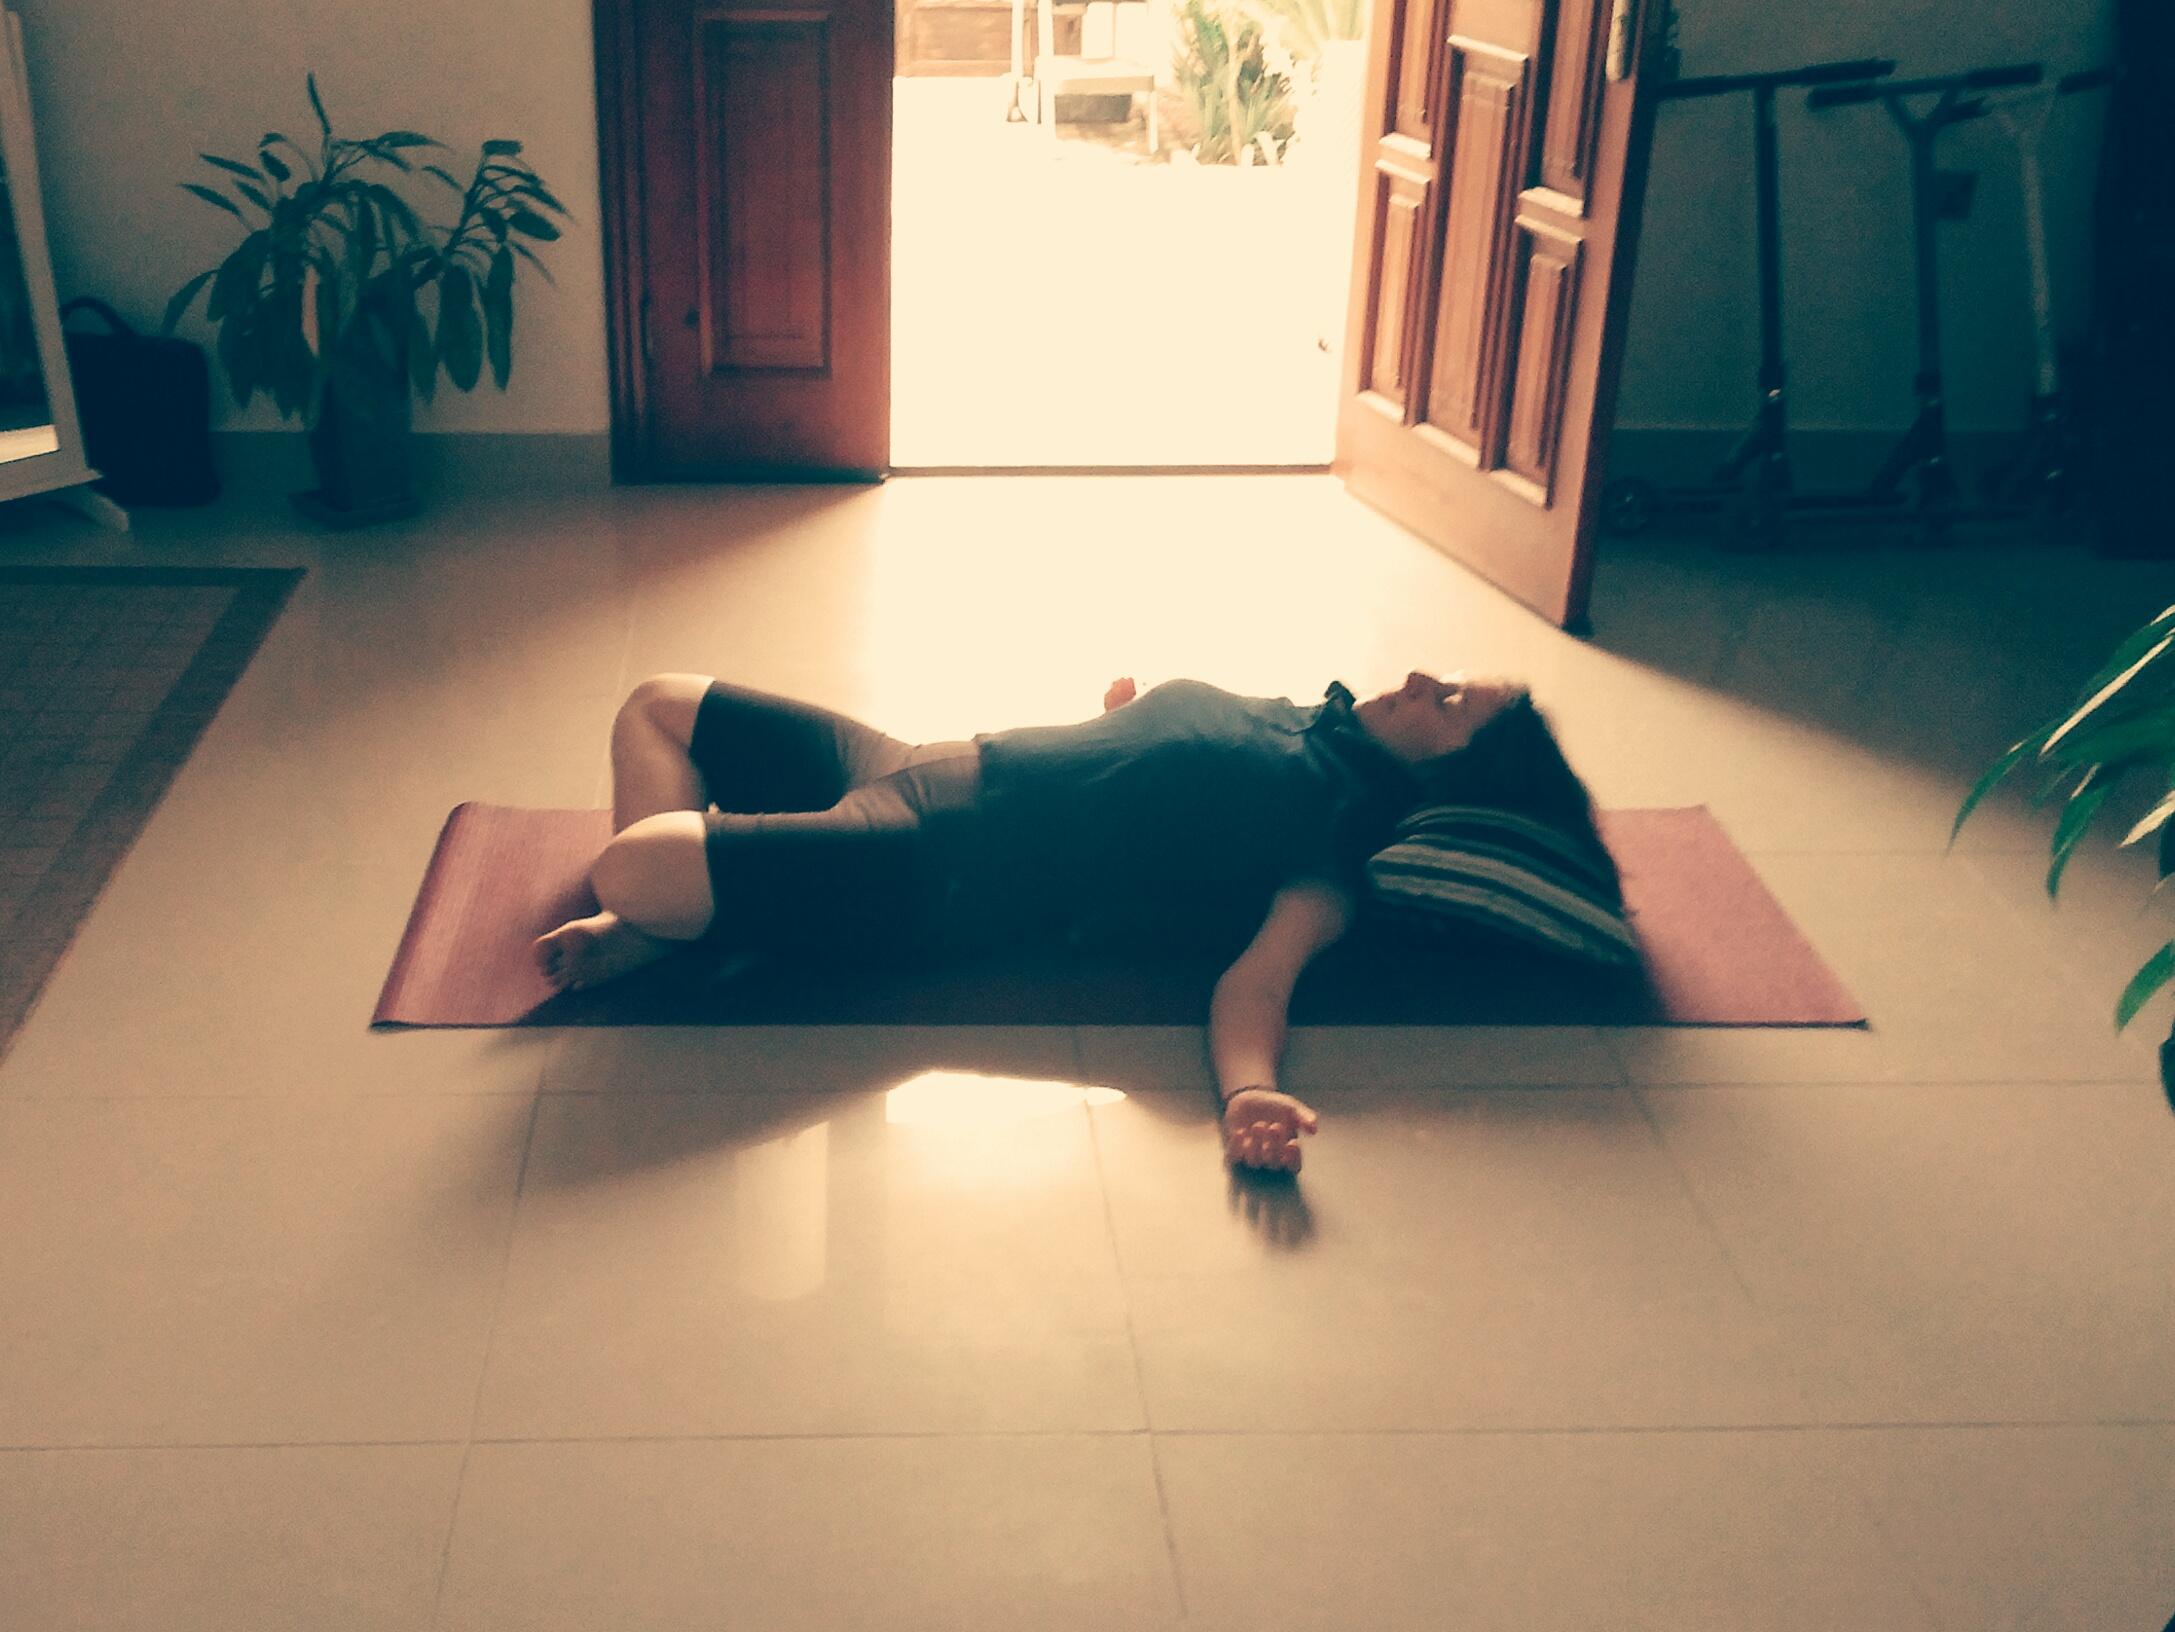 Supta Swastikasana - reclining cross legged pose